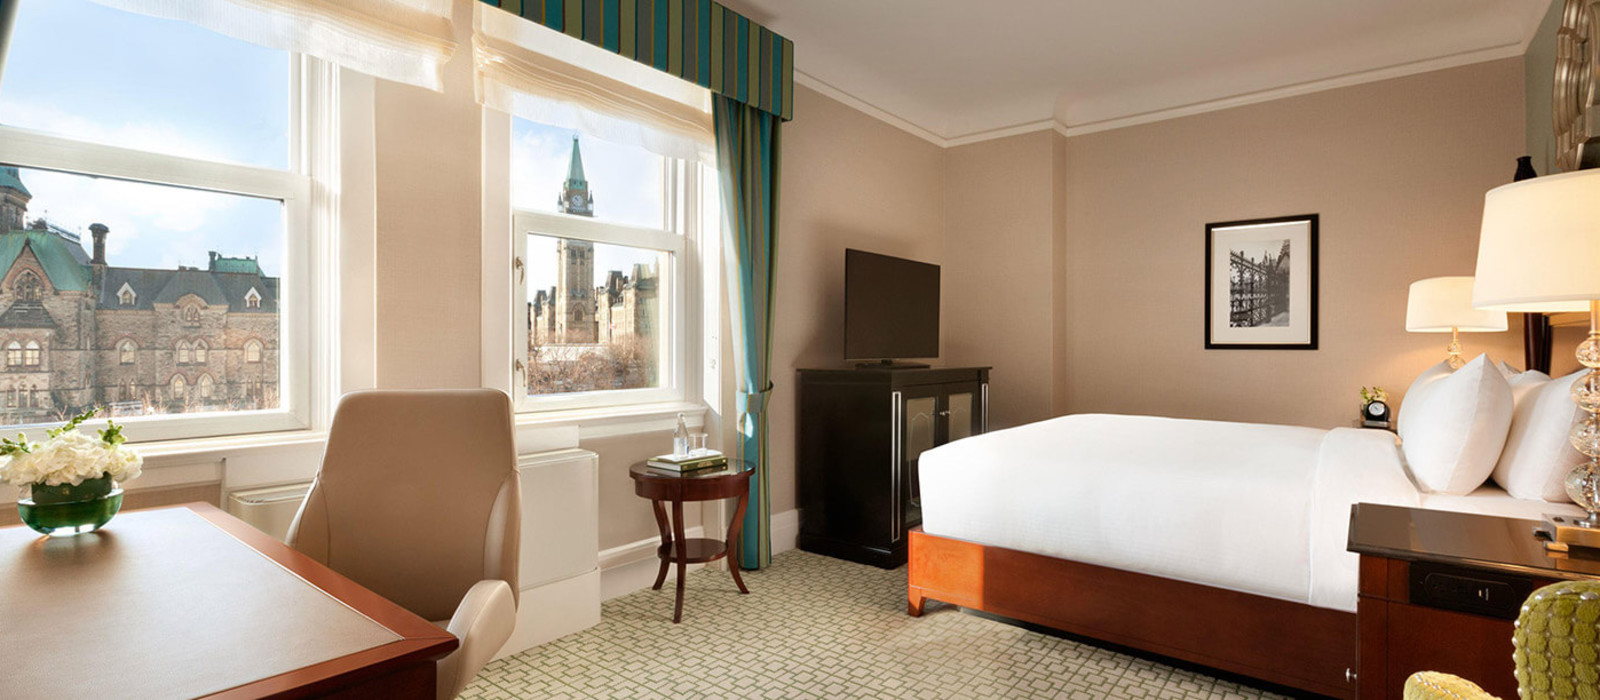 Hotel Fairmont Chateau Laurier Kanada